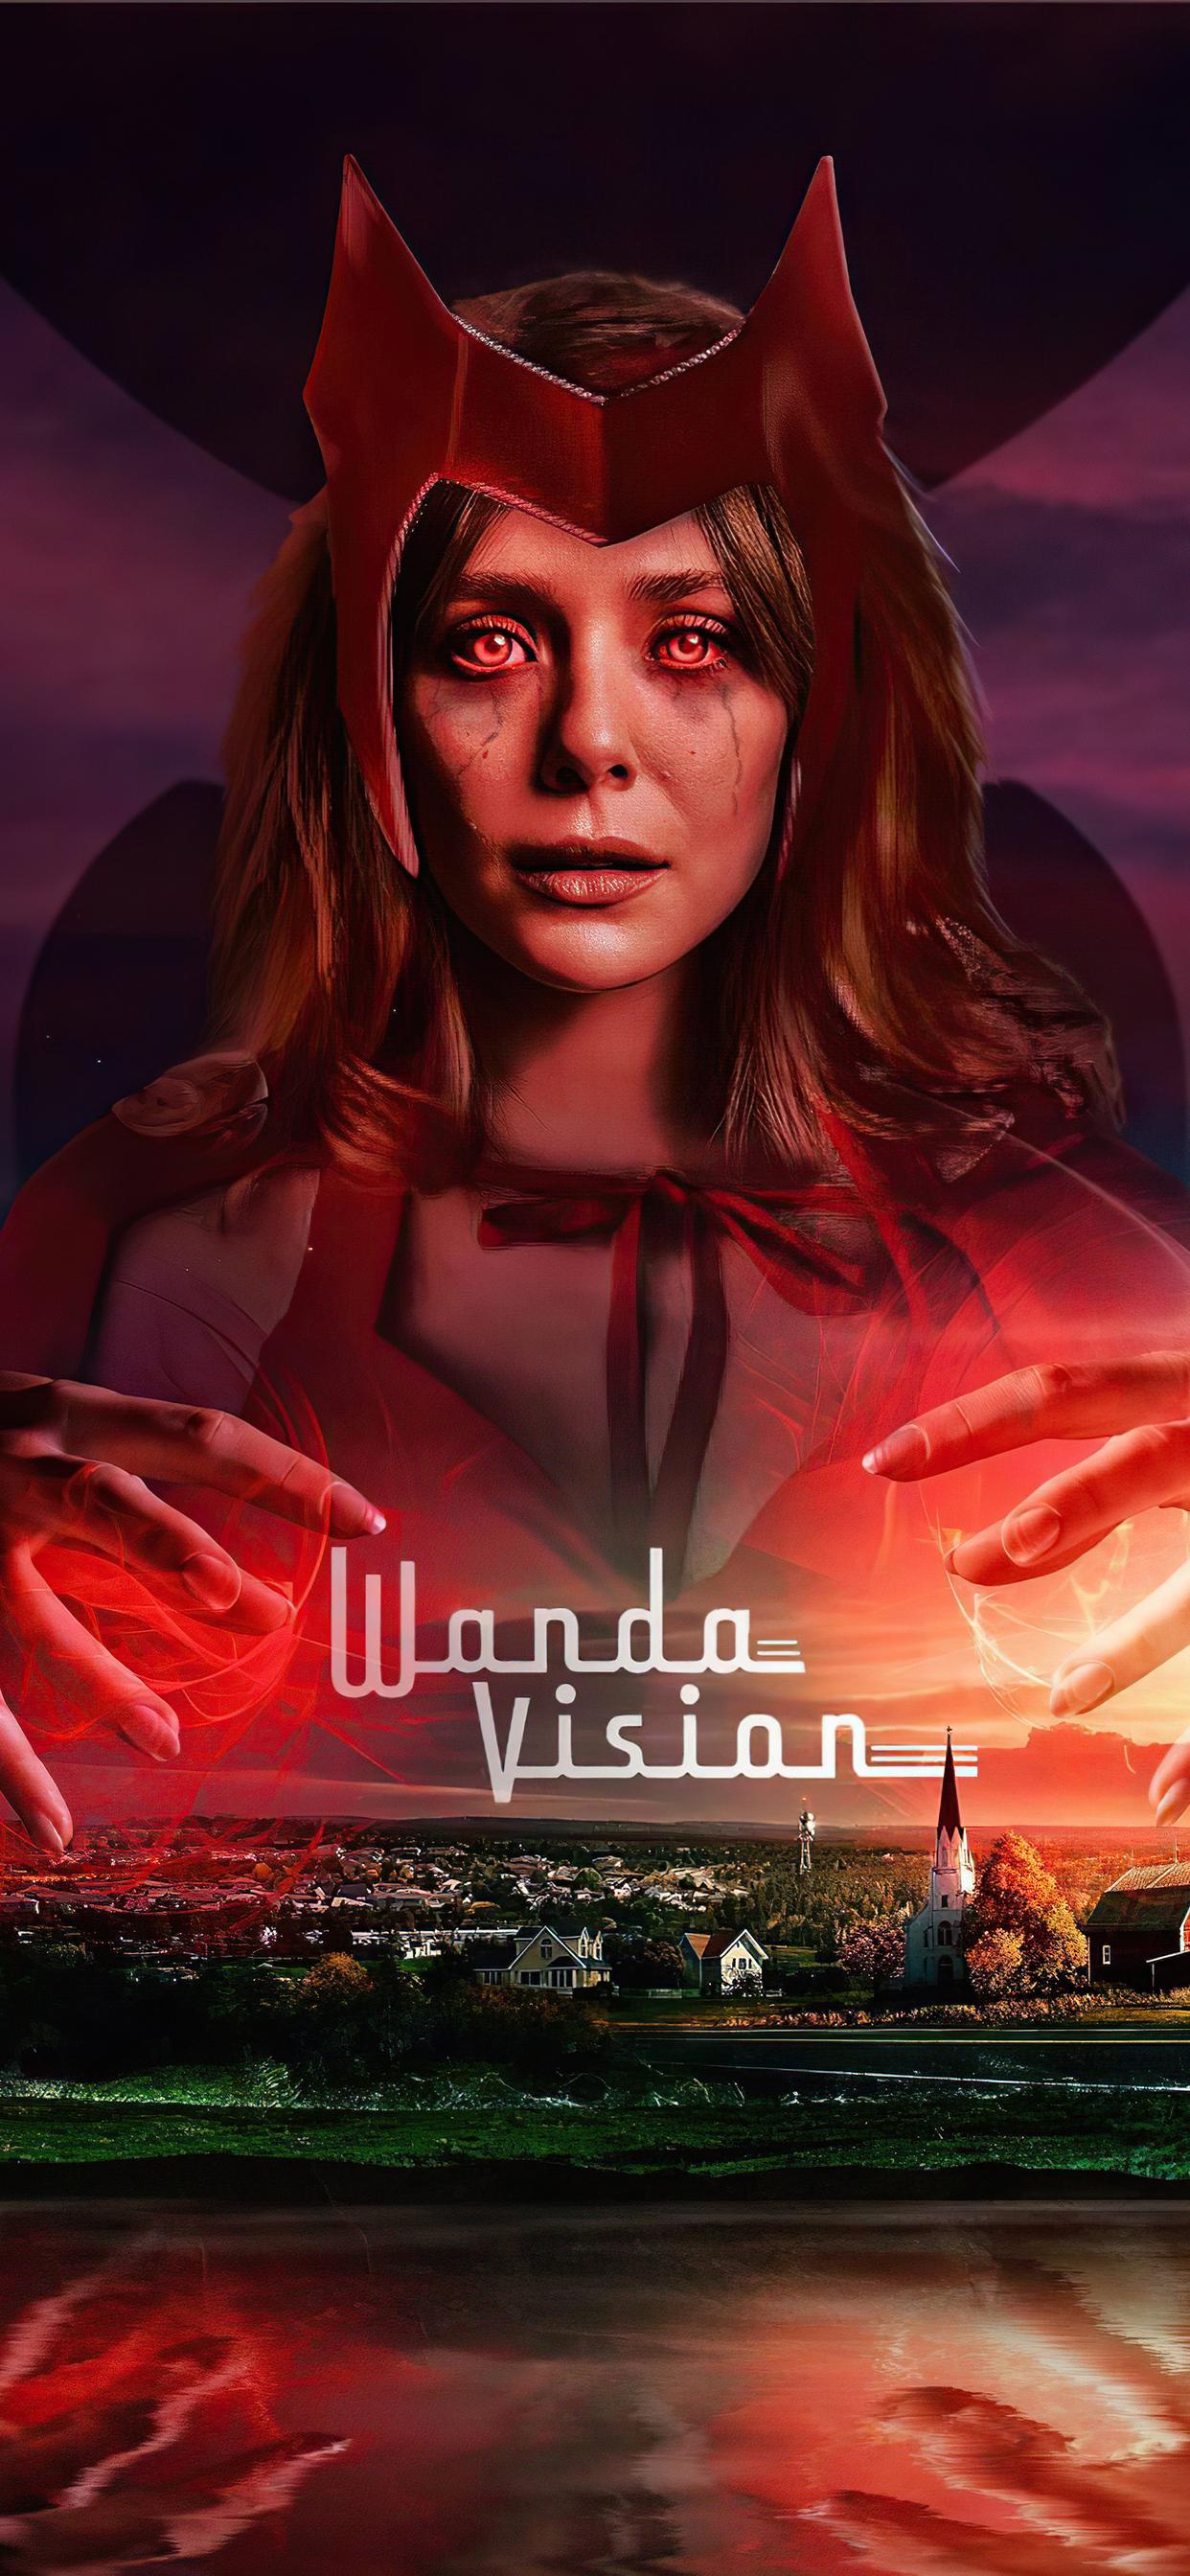 wanda-vision-season-1-poster-4k-6s.jpg